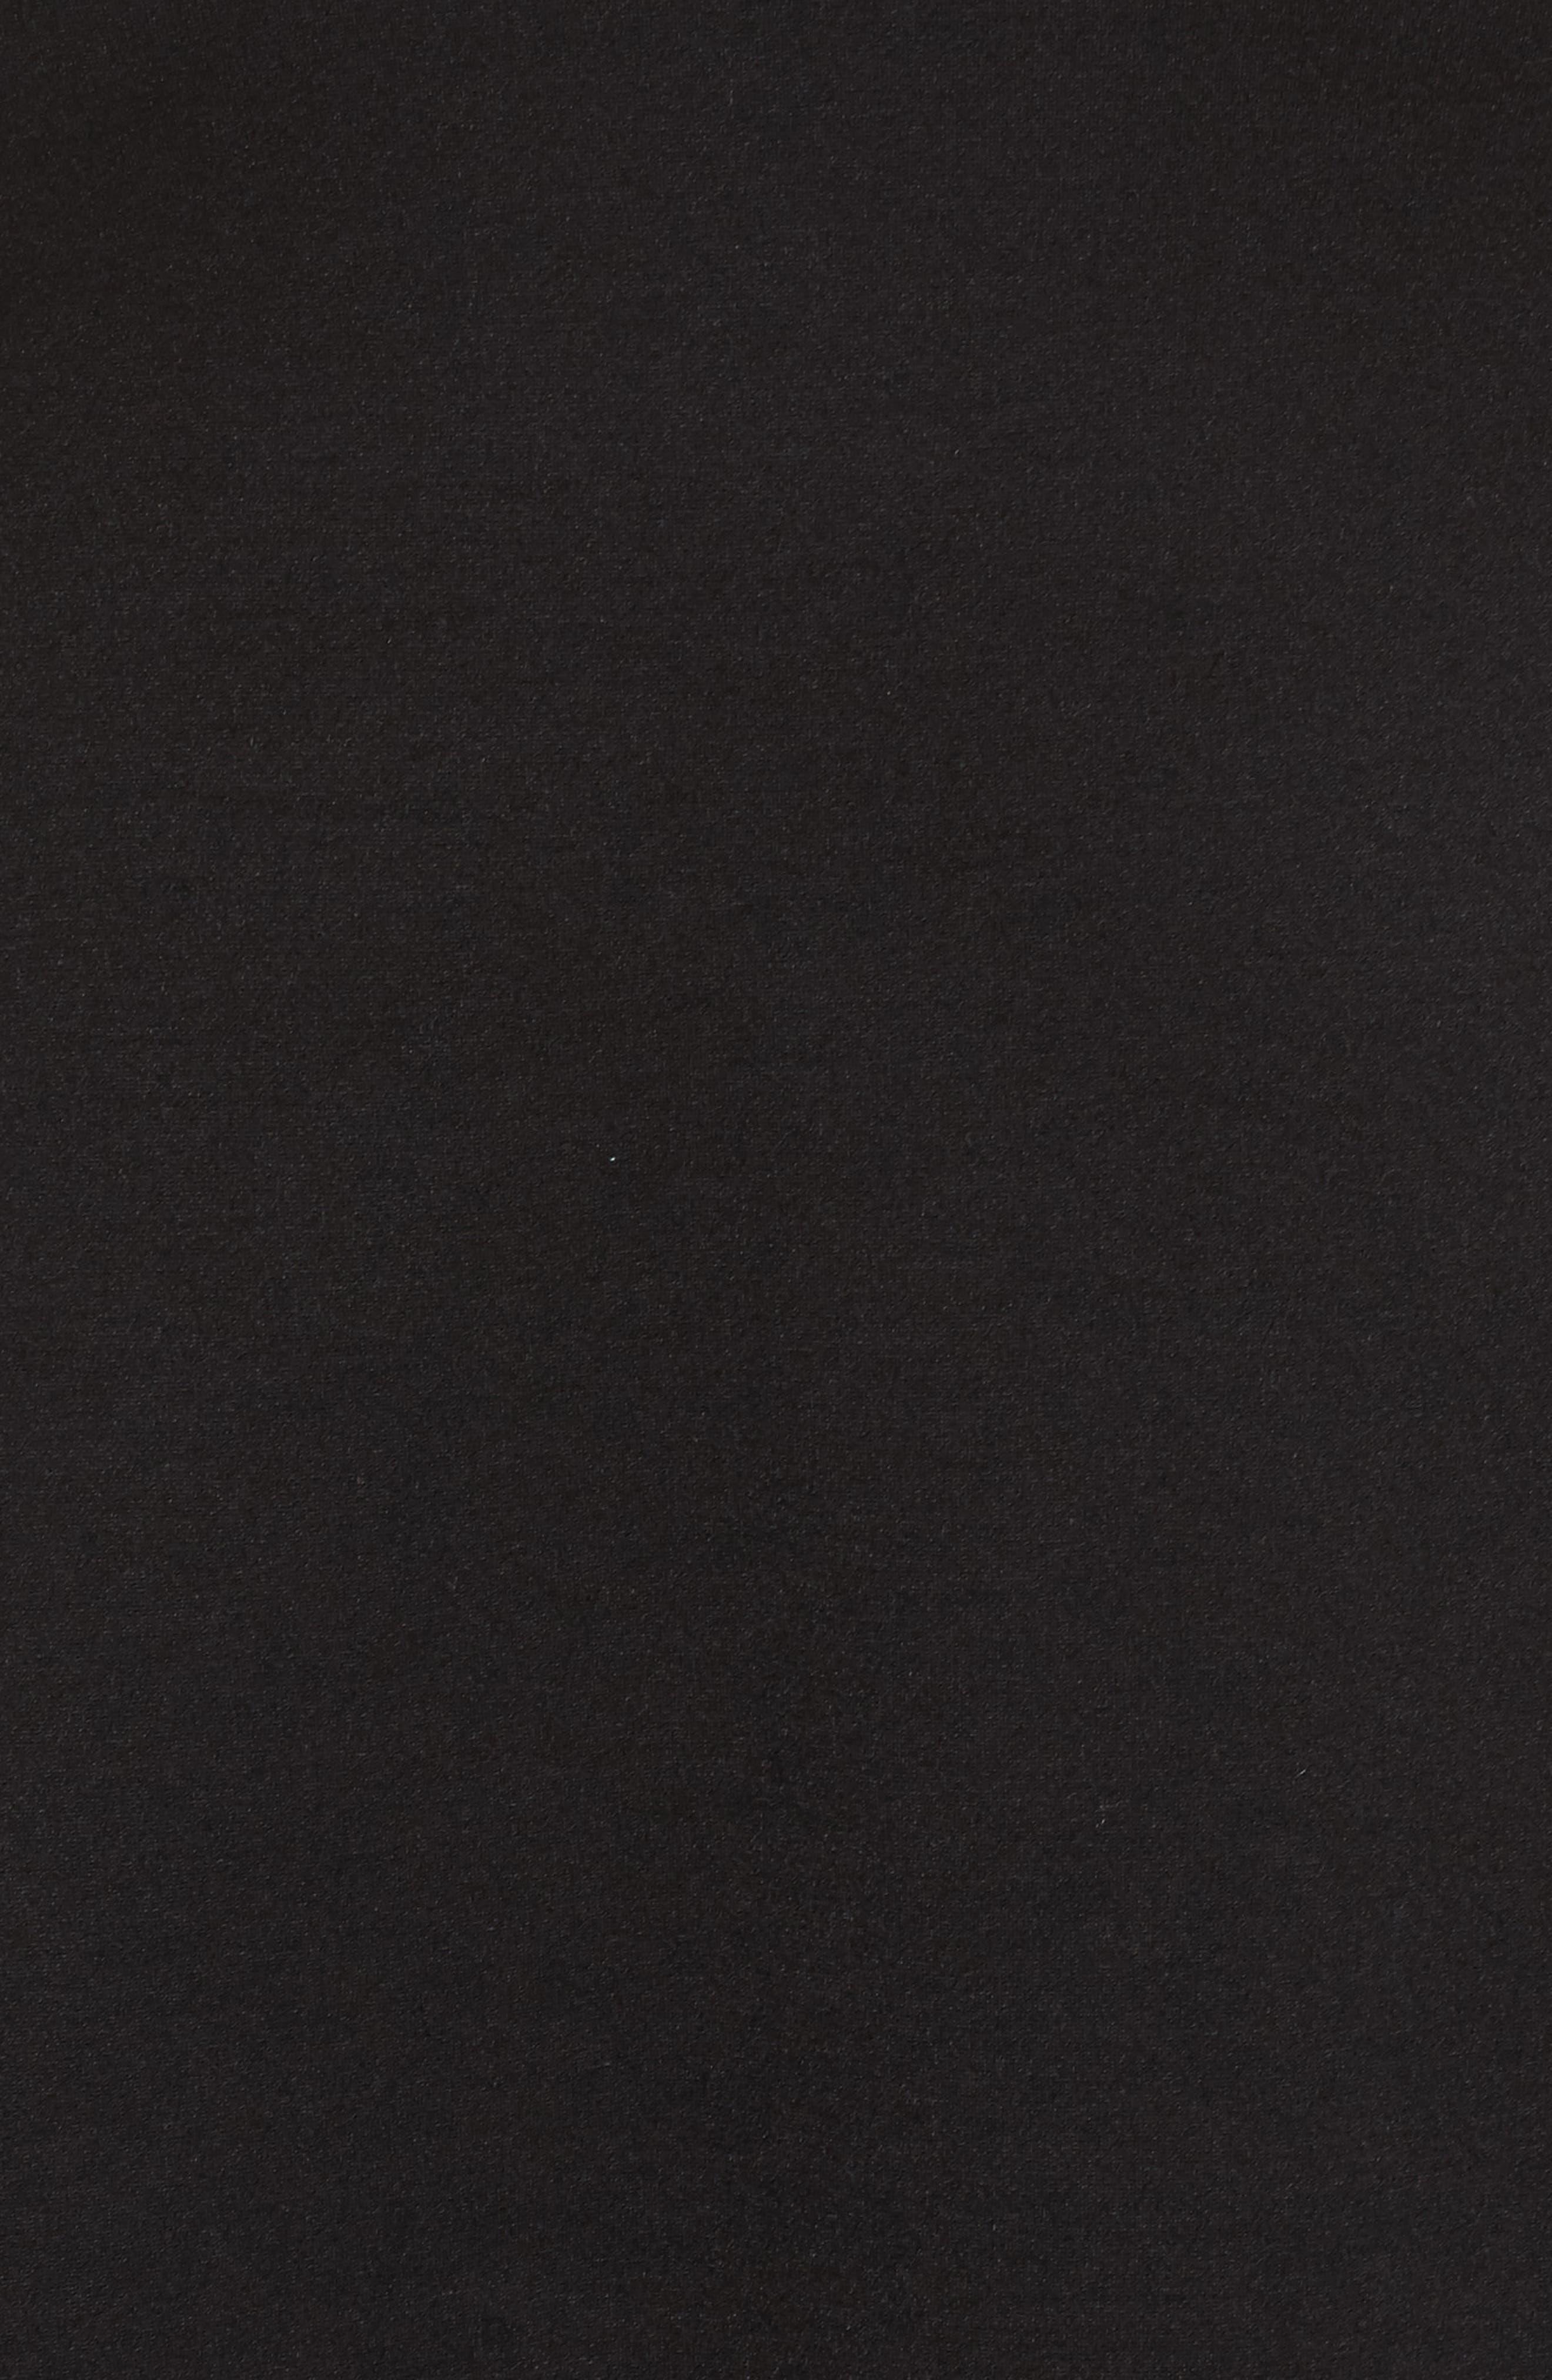 V-Neck Ponte Fit & Flare Dress,                             Alternate thumbnail 6, color,                             BLACK